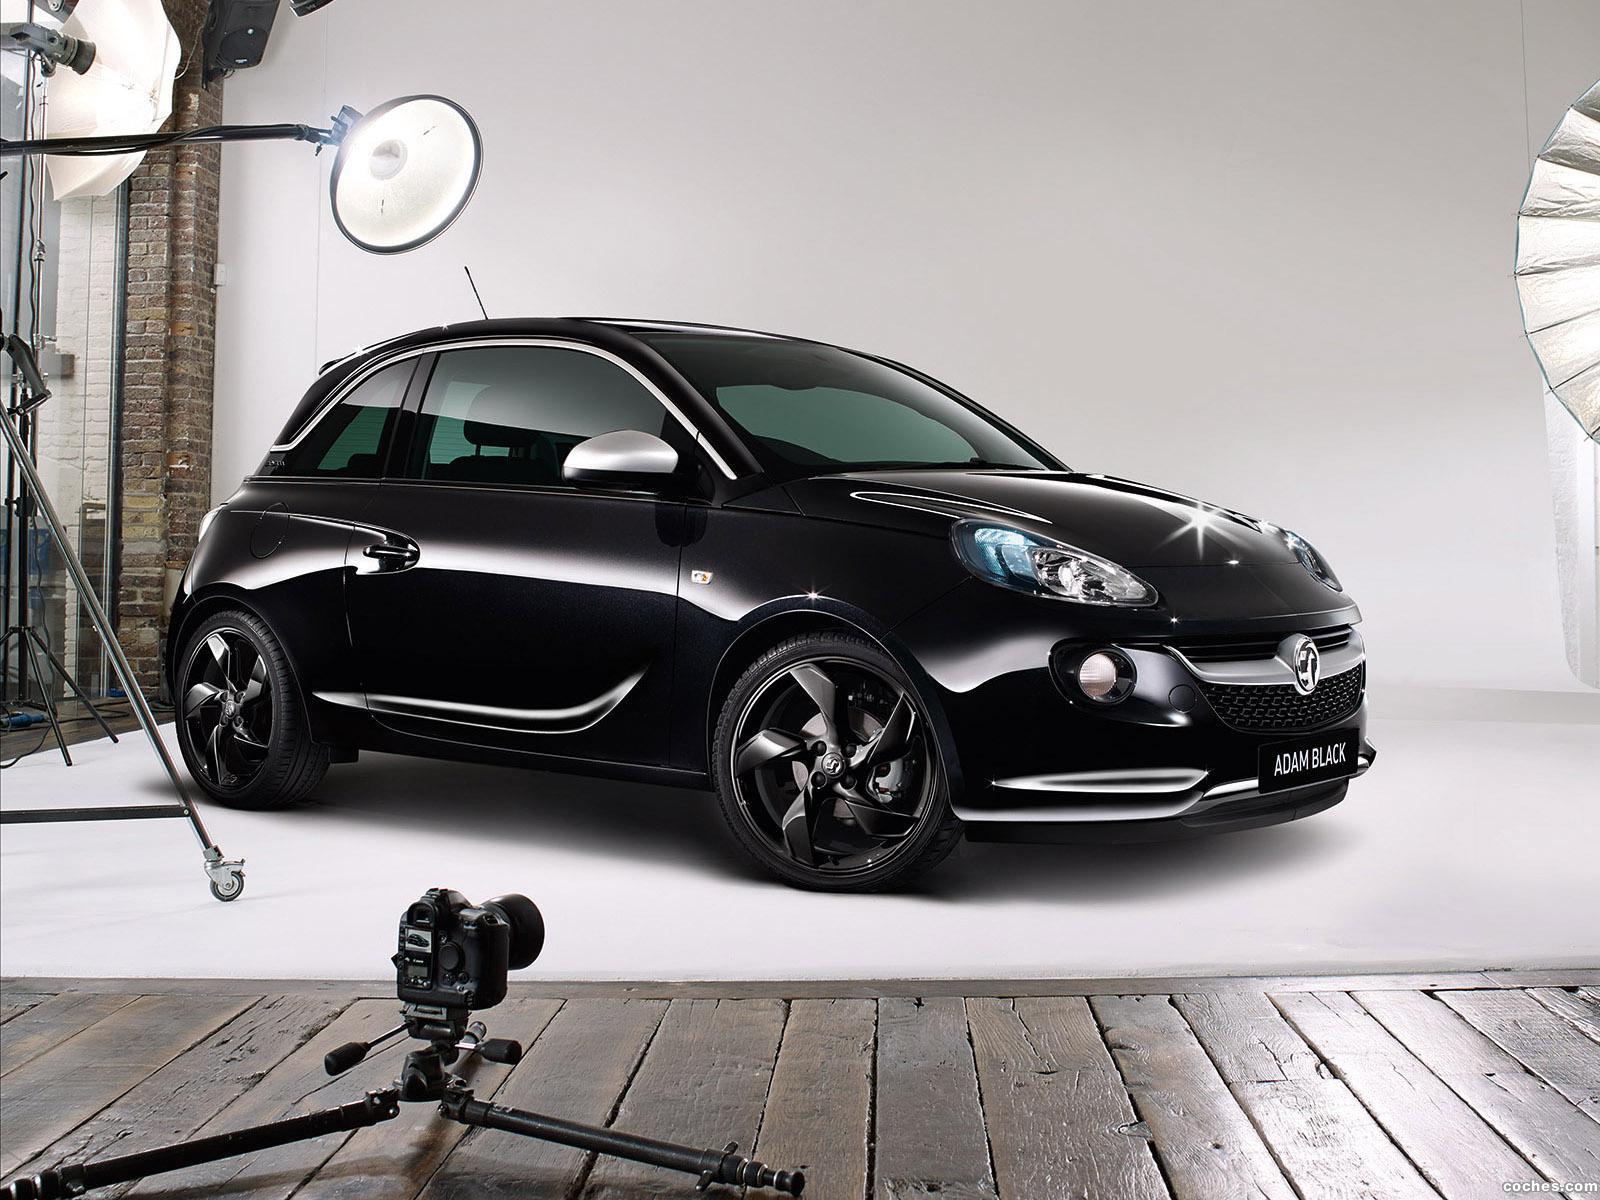 Foto 0 de Vauxhall Adam Black Edition 2014